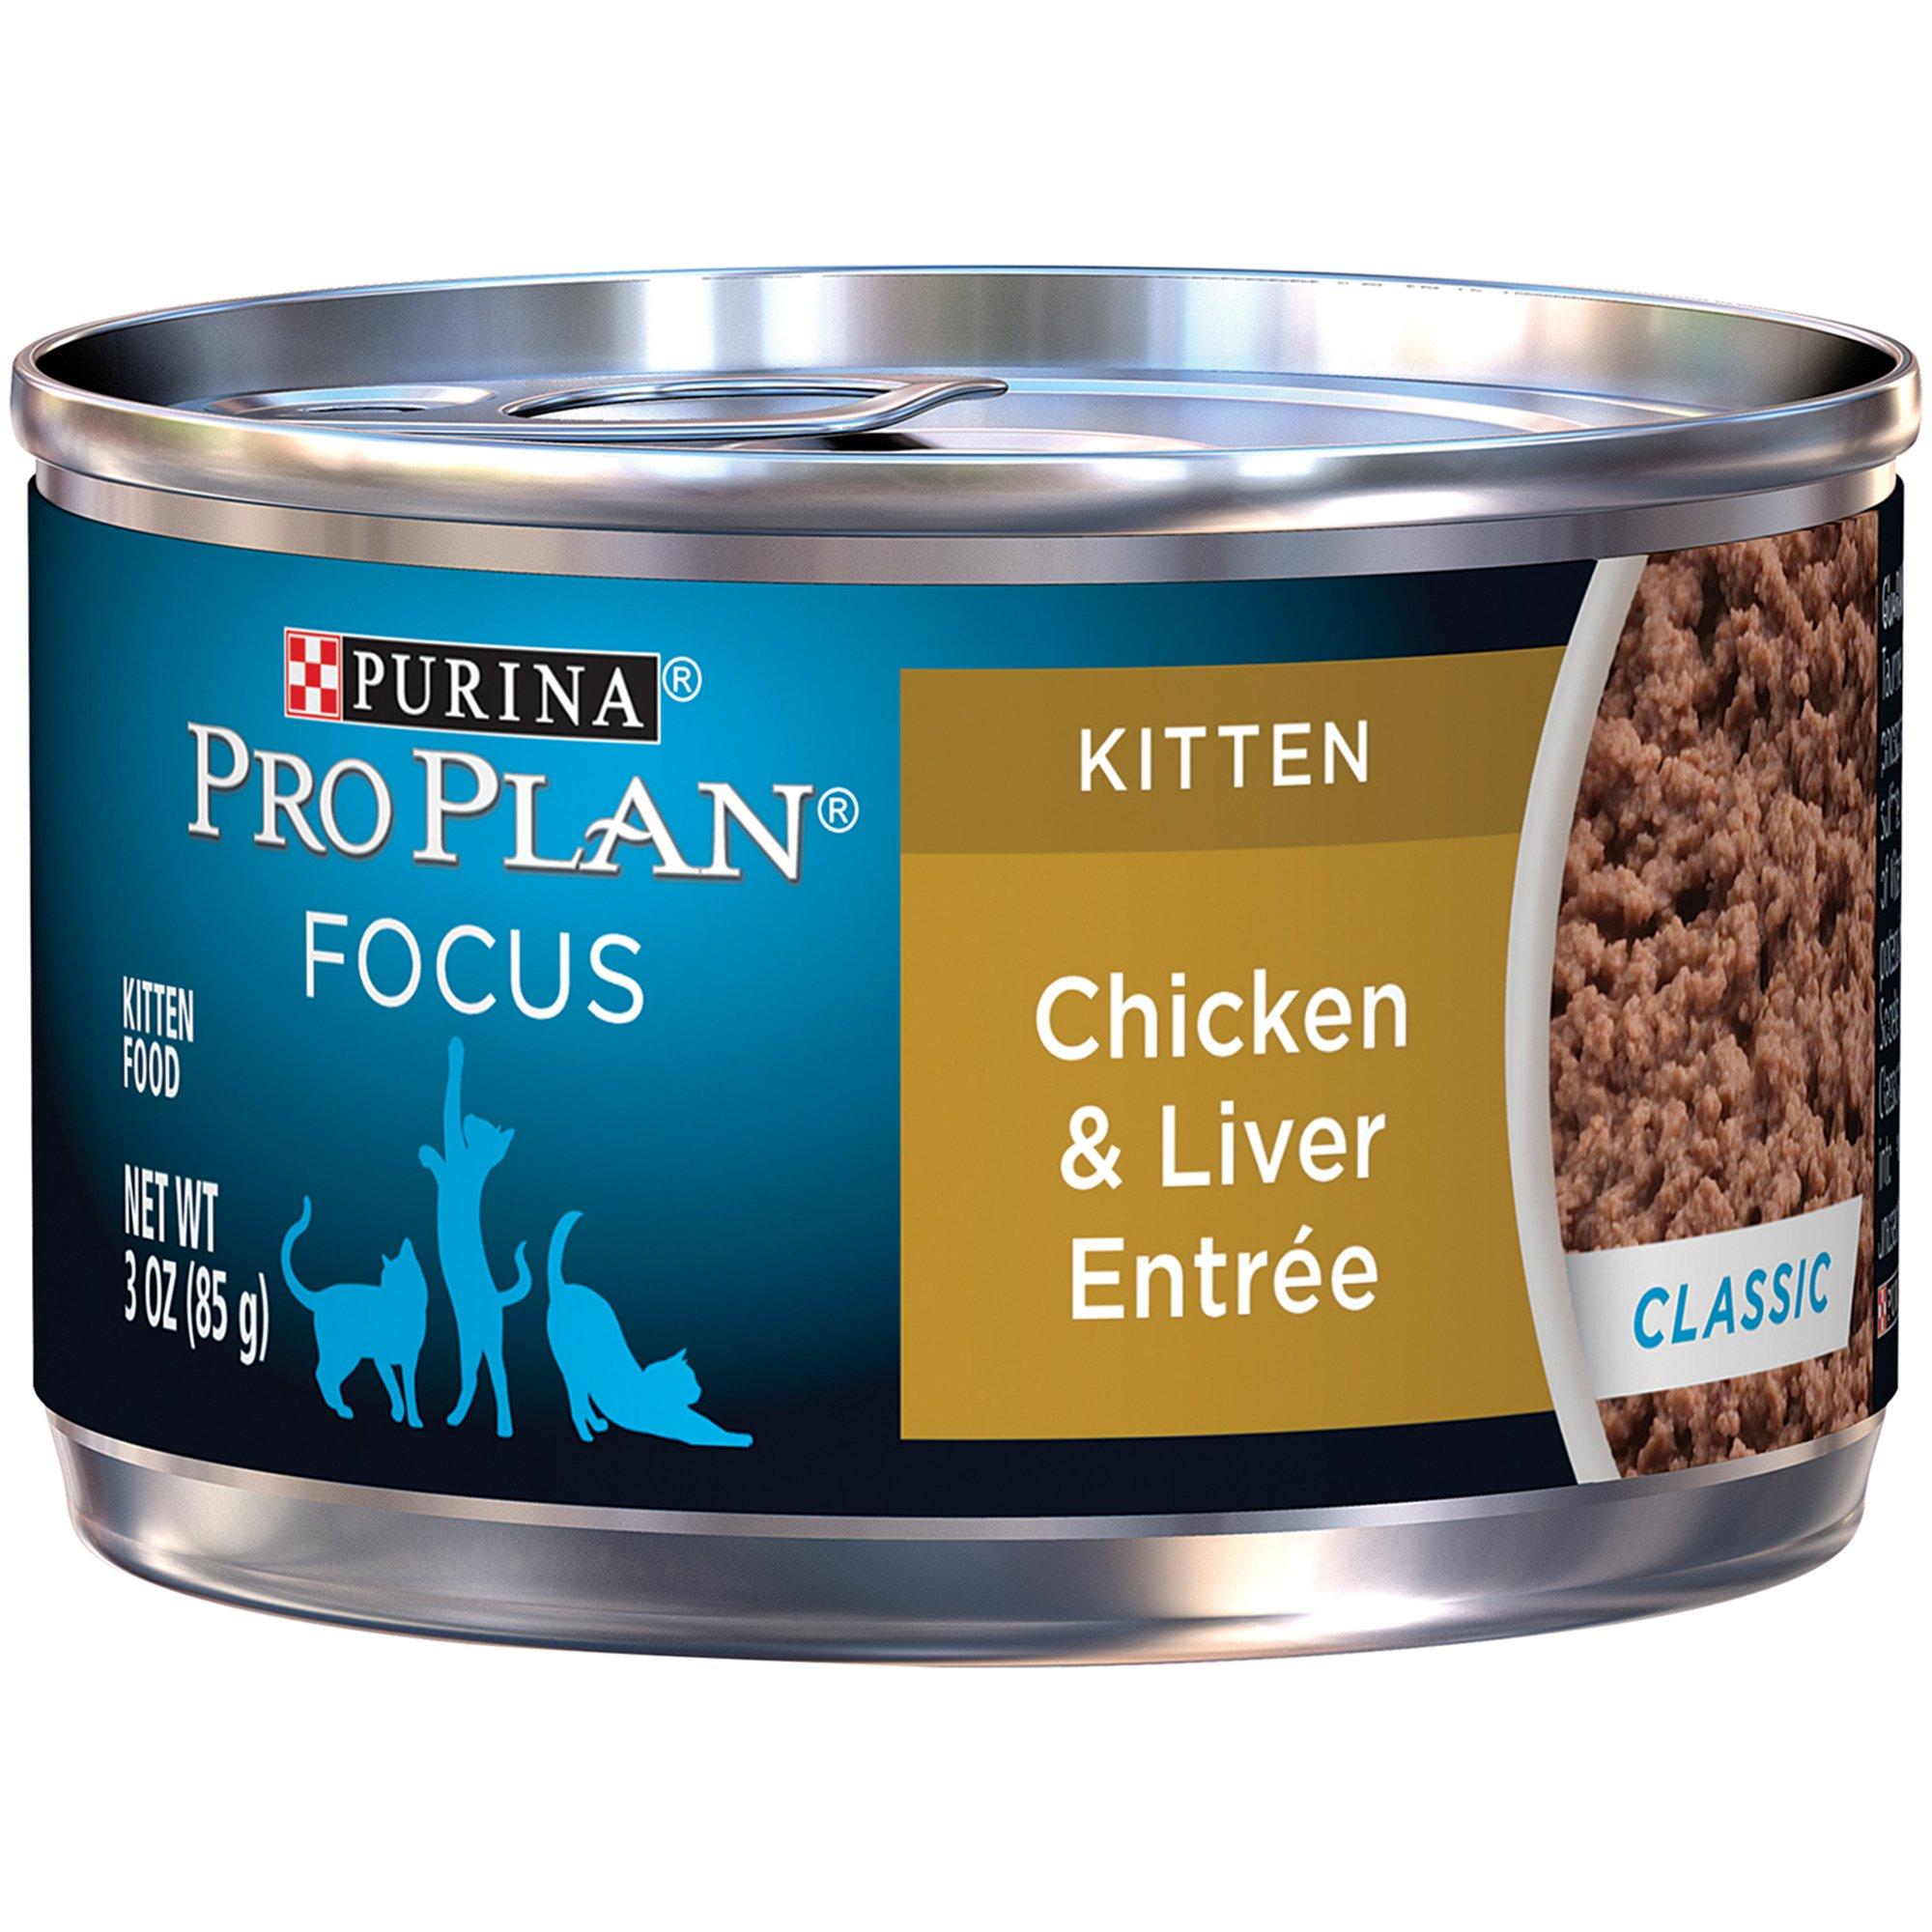 Pro Plan Focus Chicken & Liver Canned Kitten Food